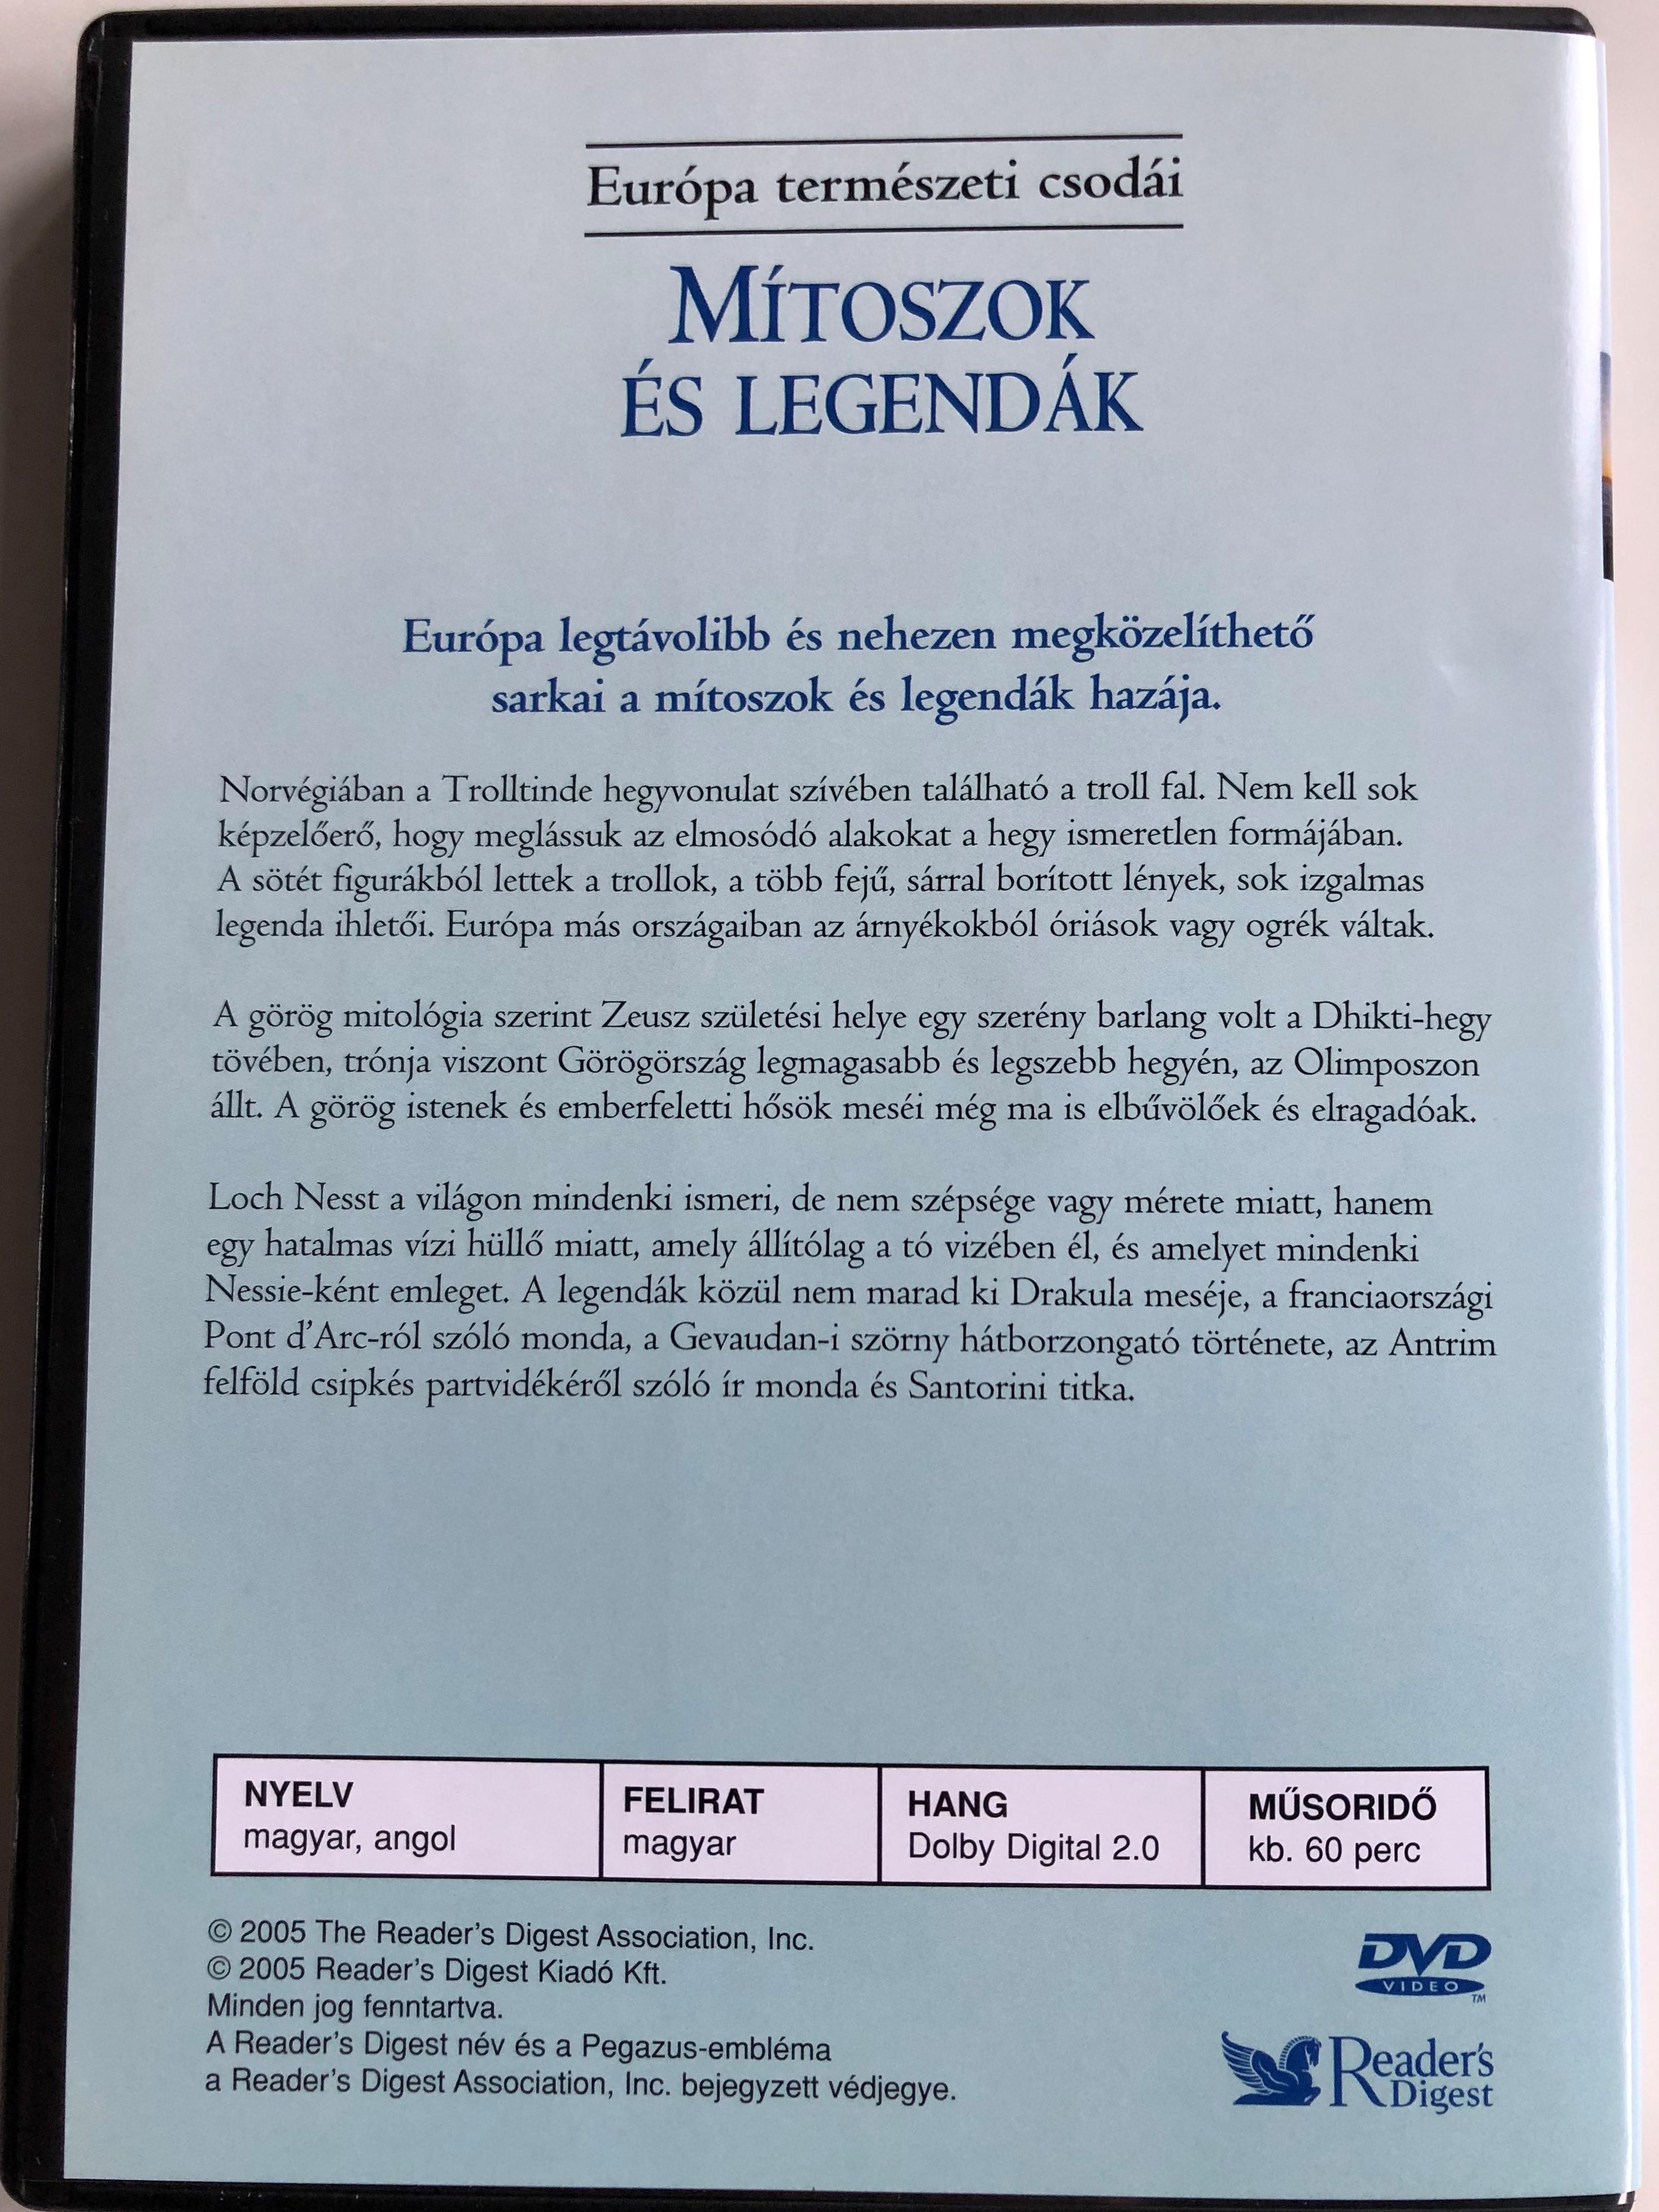 m-toszok-s-legend-k-eur-pa-term-szeti-csod-i-dvd-2005-reader-s-digest-2.jpg